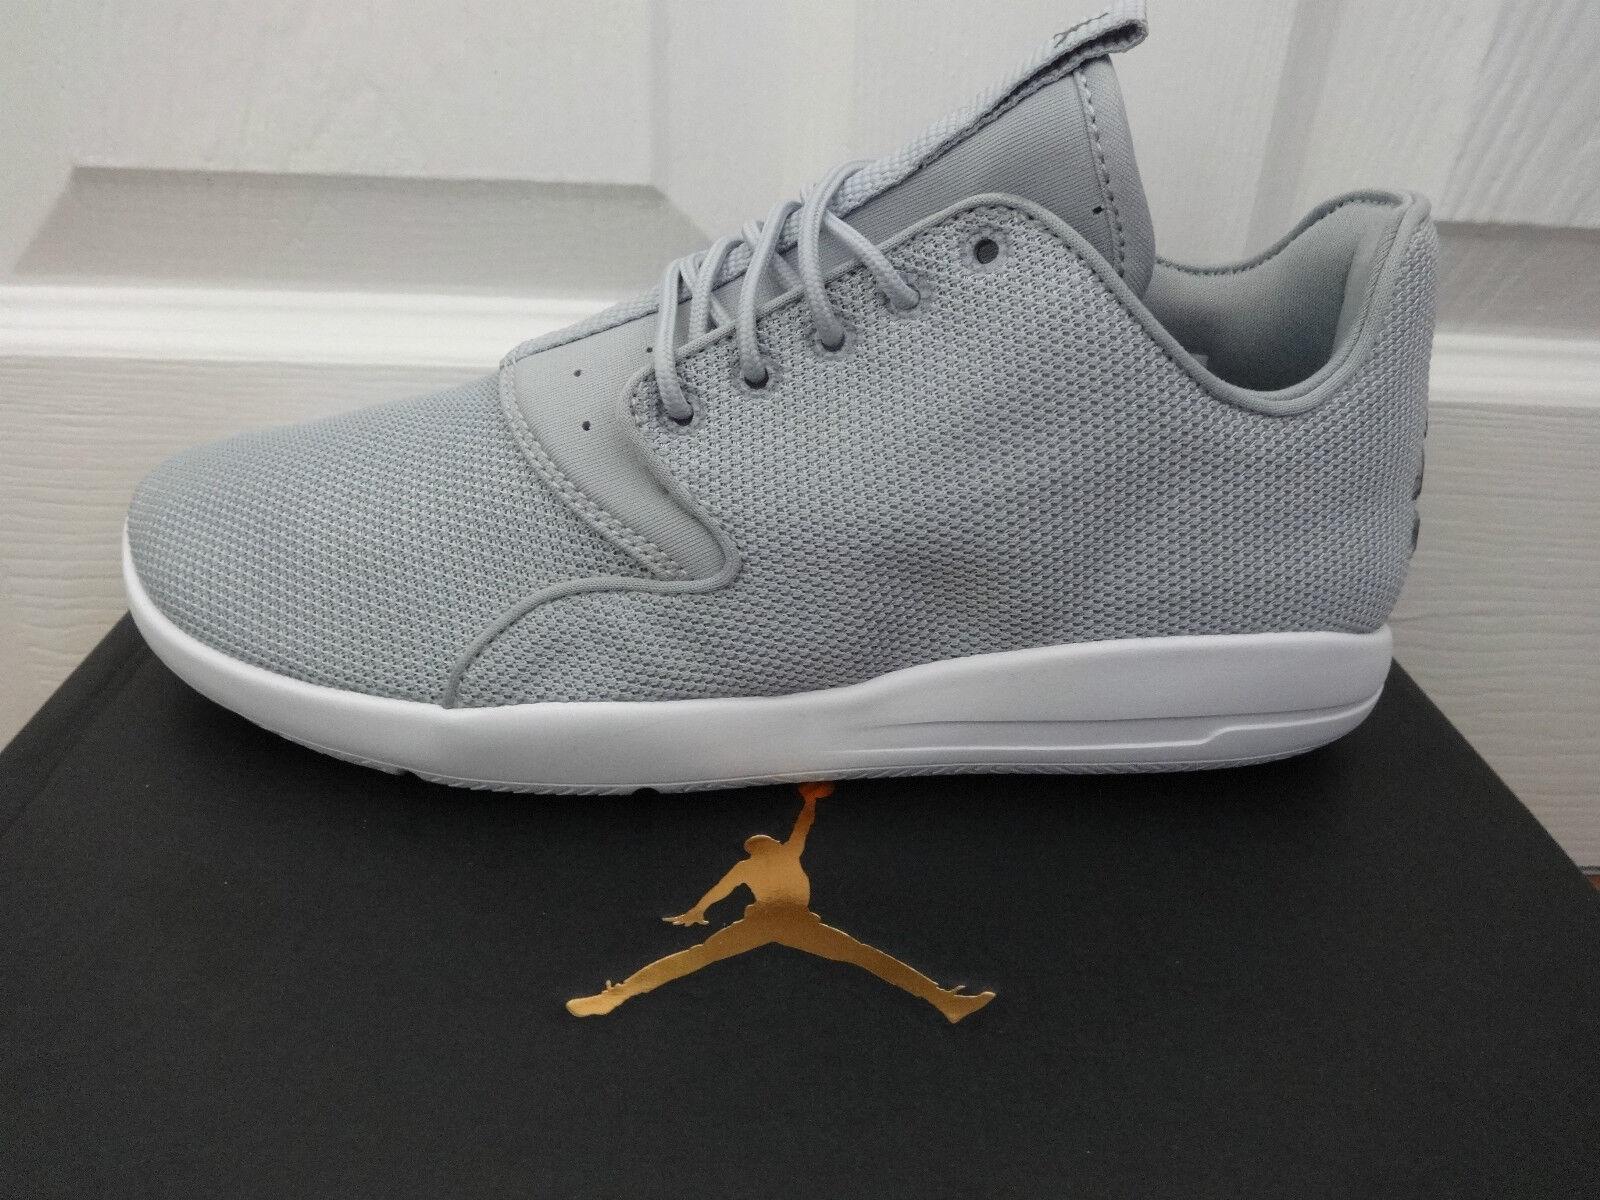 Nike Jordan Eclipse homme trainers Baskets chaussures 724010 013 013 013 NEWBOX 1620cd